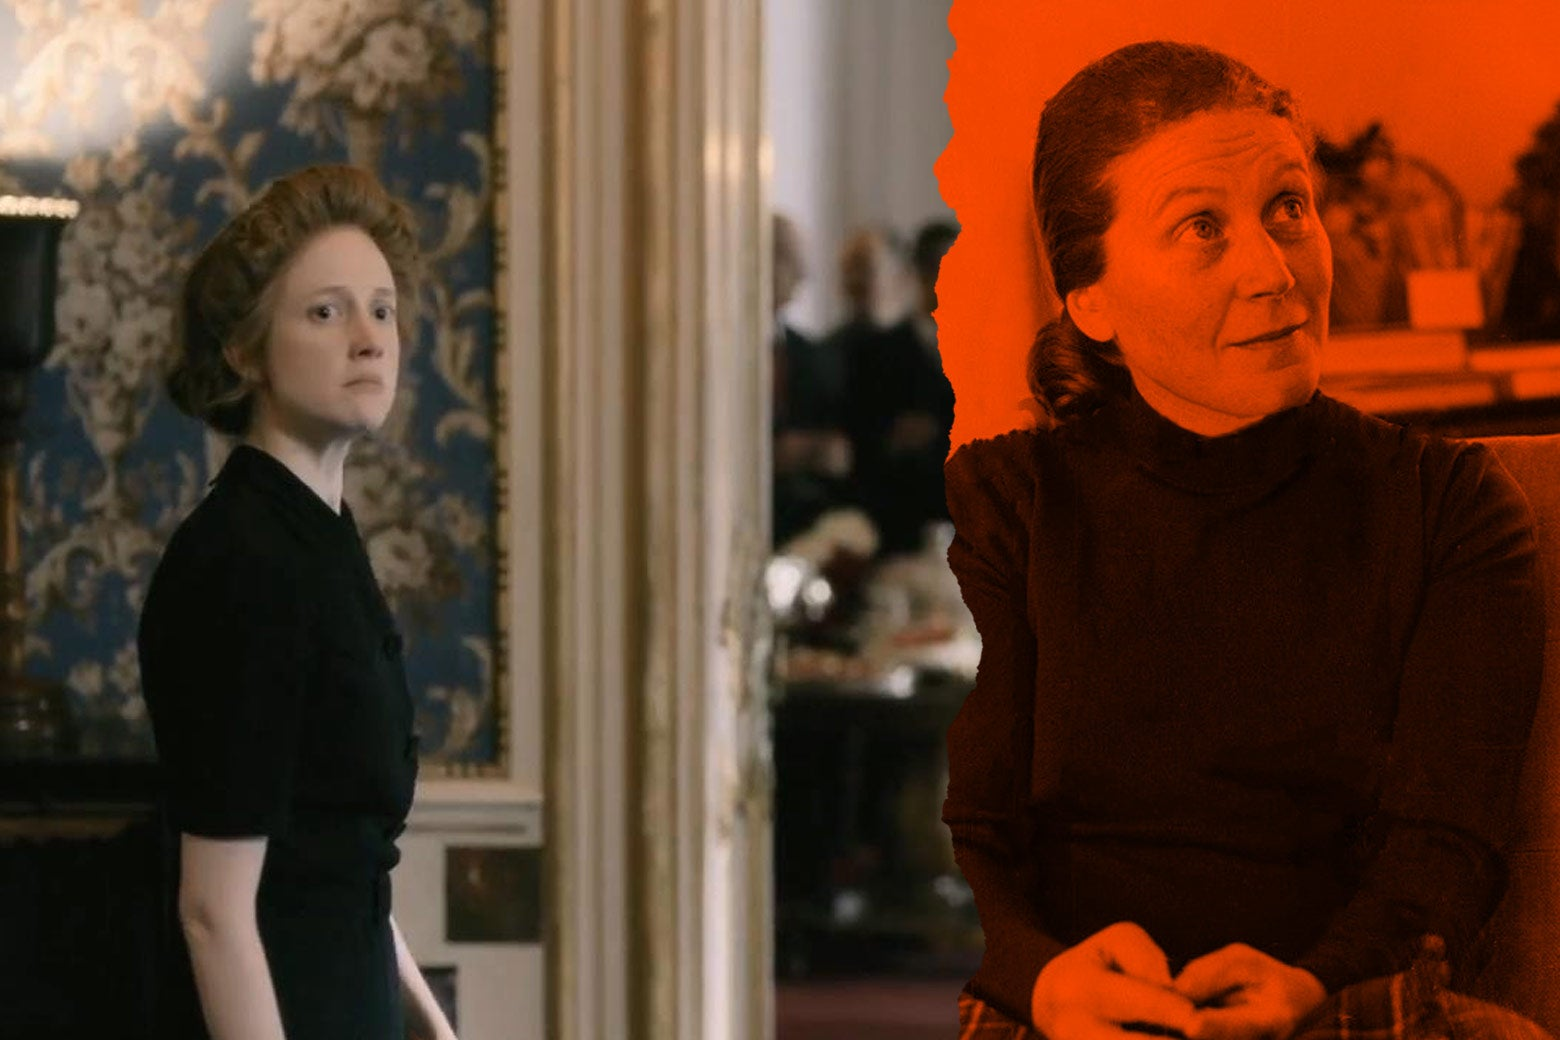 At left: Andrea Riseborough as Svetlana Stalina in the film. At right: the real Svetlana Stalina.